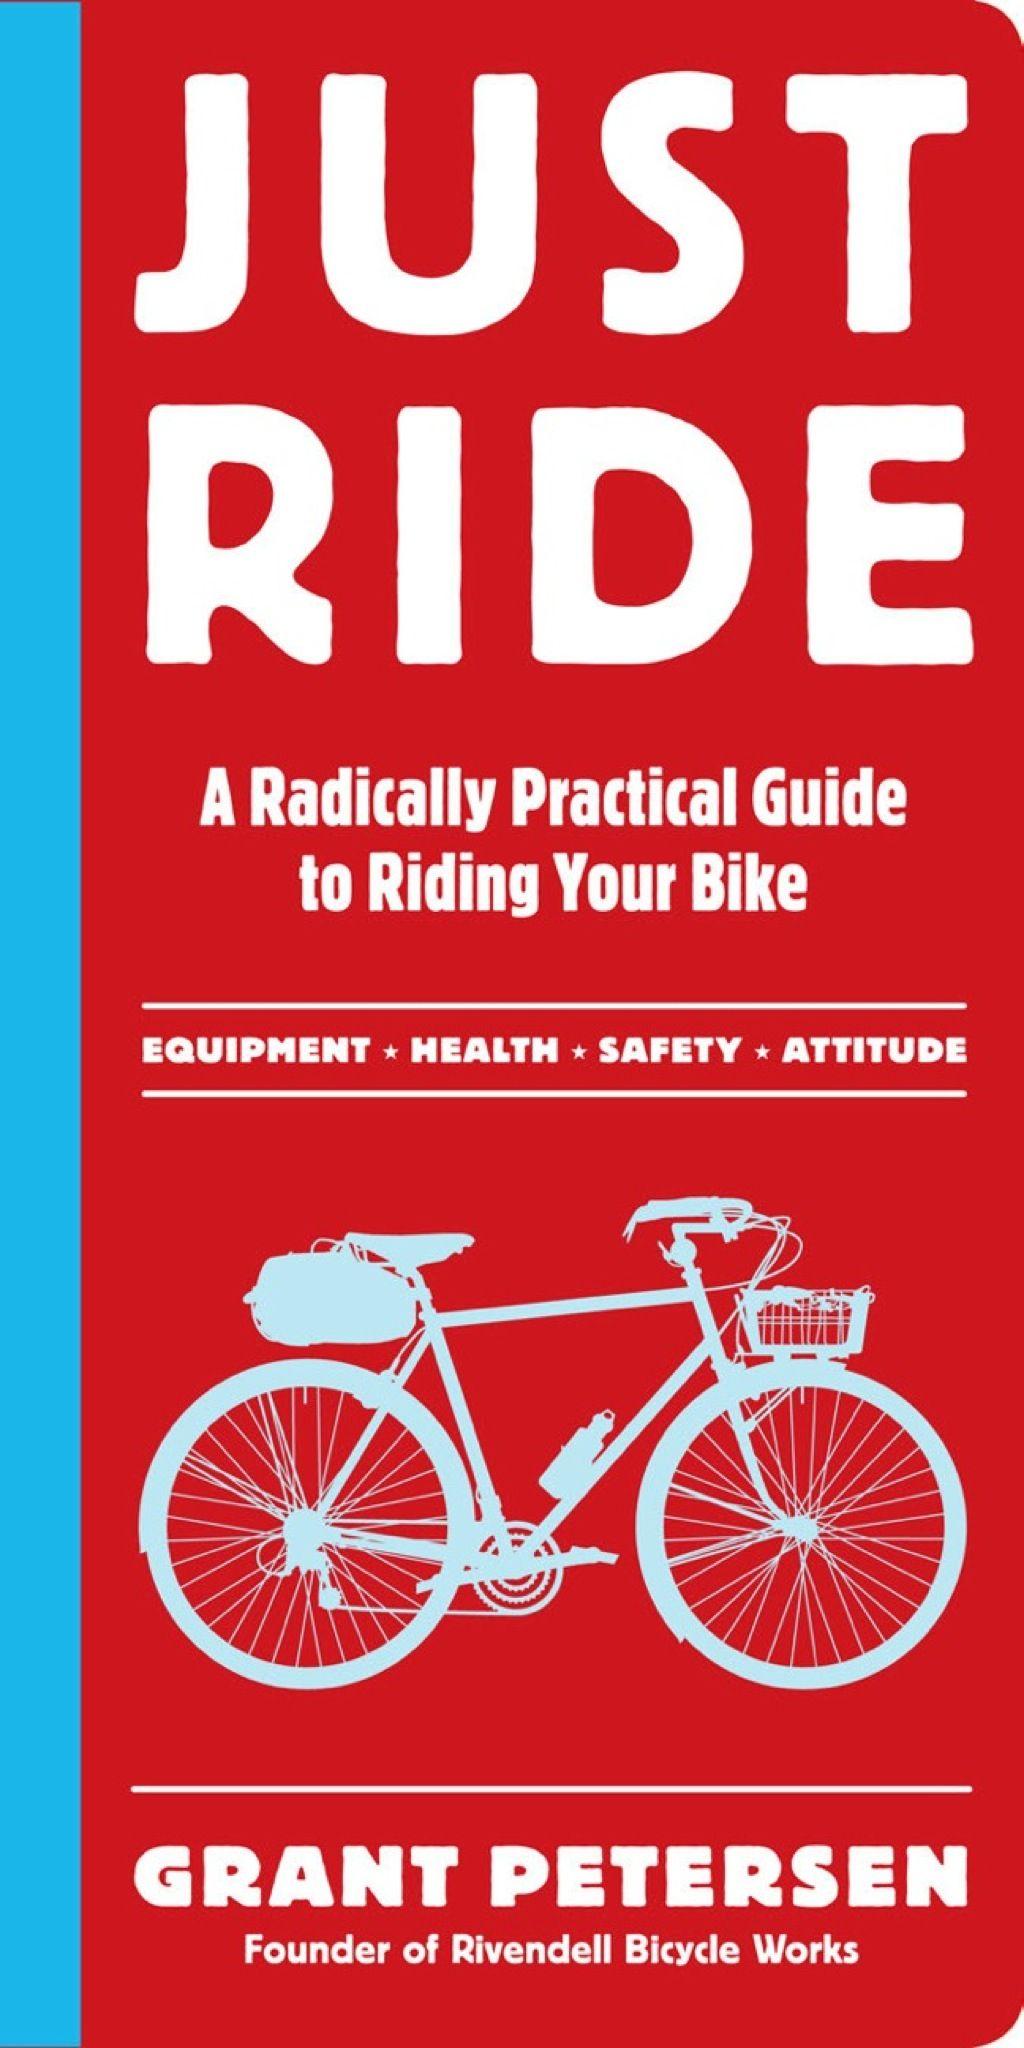 Just Ride Ebook Bicycle Bike Riding